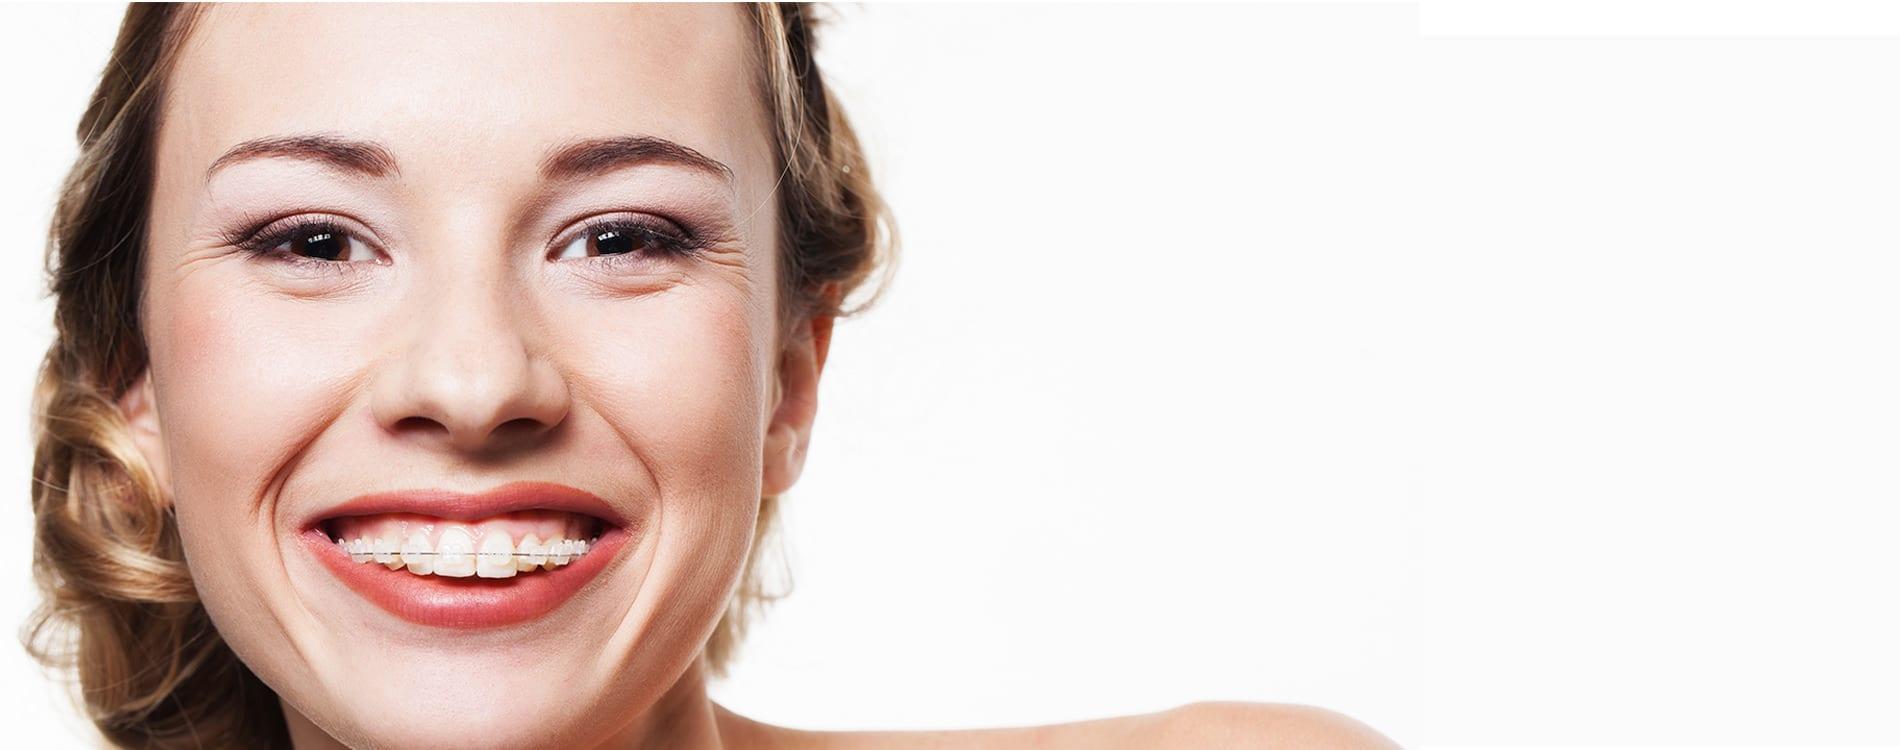 Mujer sonriendo con brackets